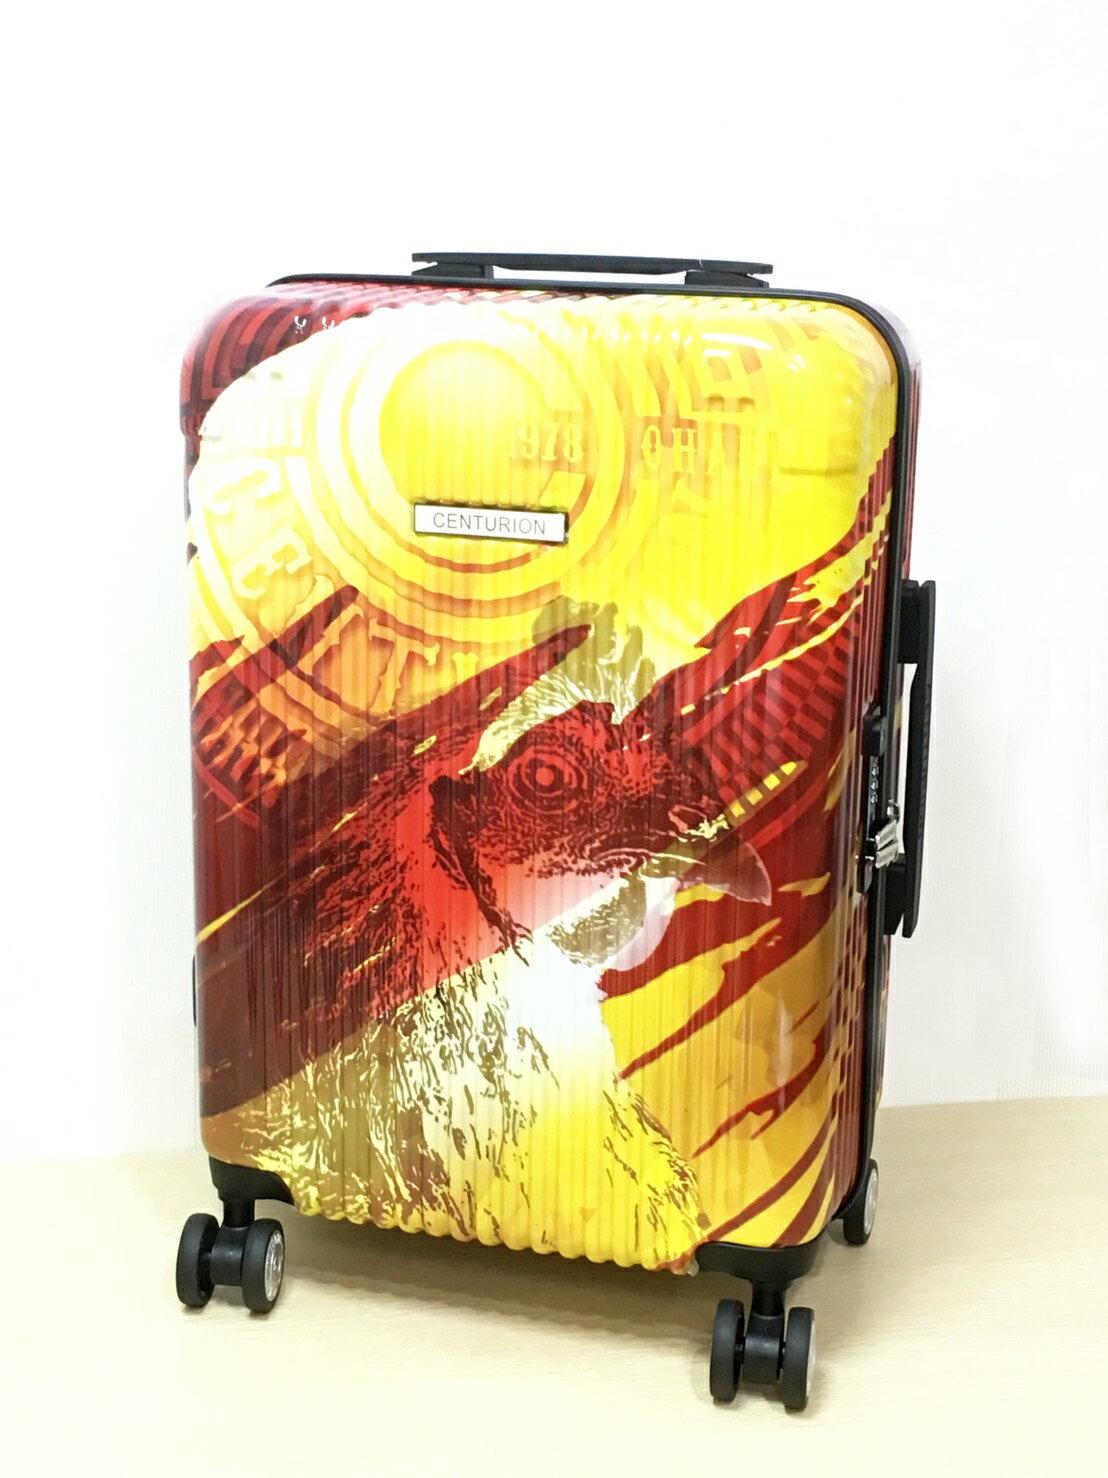 CENTURION 百夫長 22吋行李箱-發財金雞款